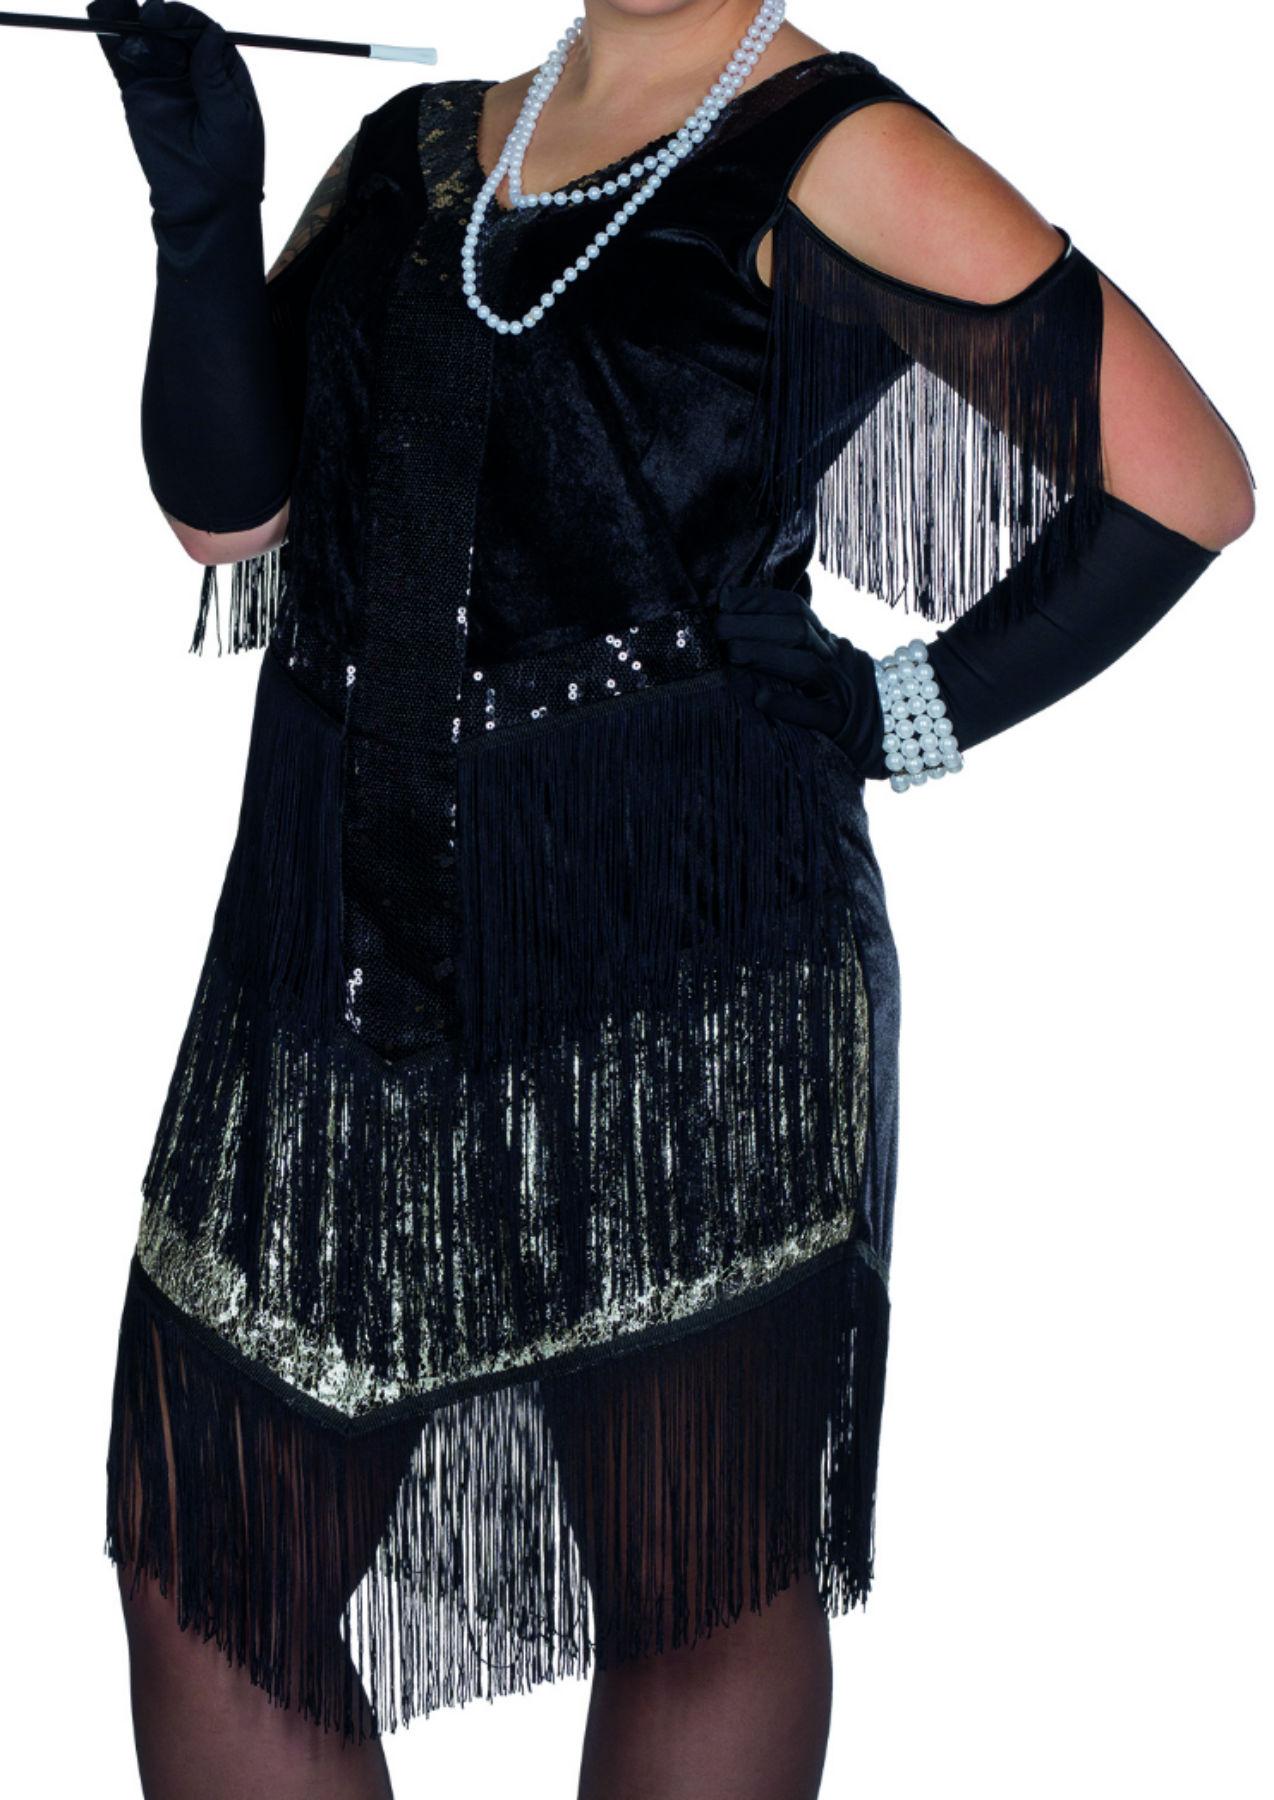 kostüm charleston kleid 20er jahre flapper krimi große größen karneval  silvester